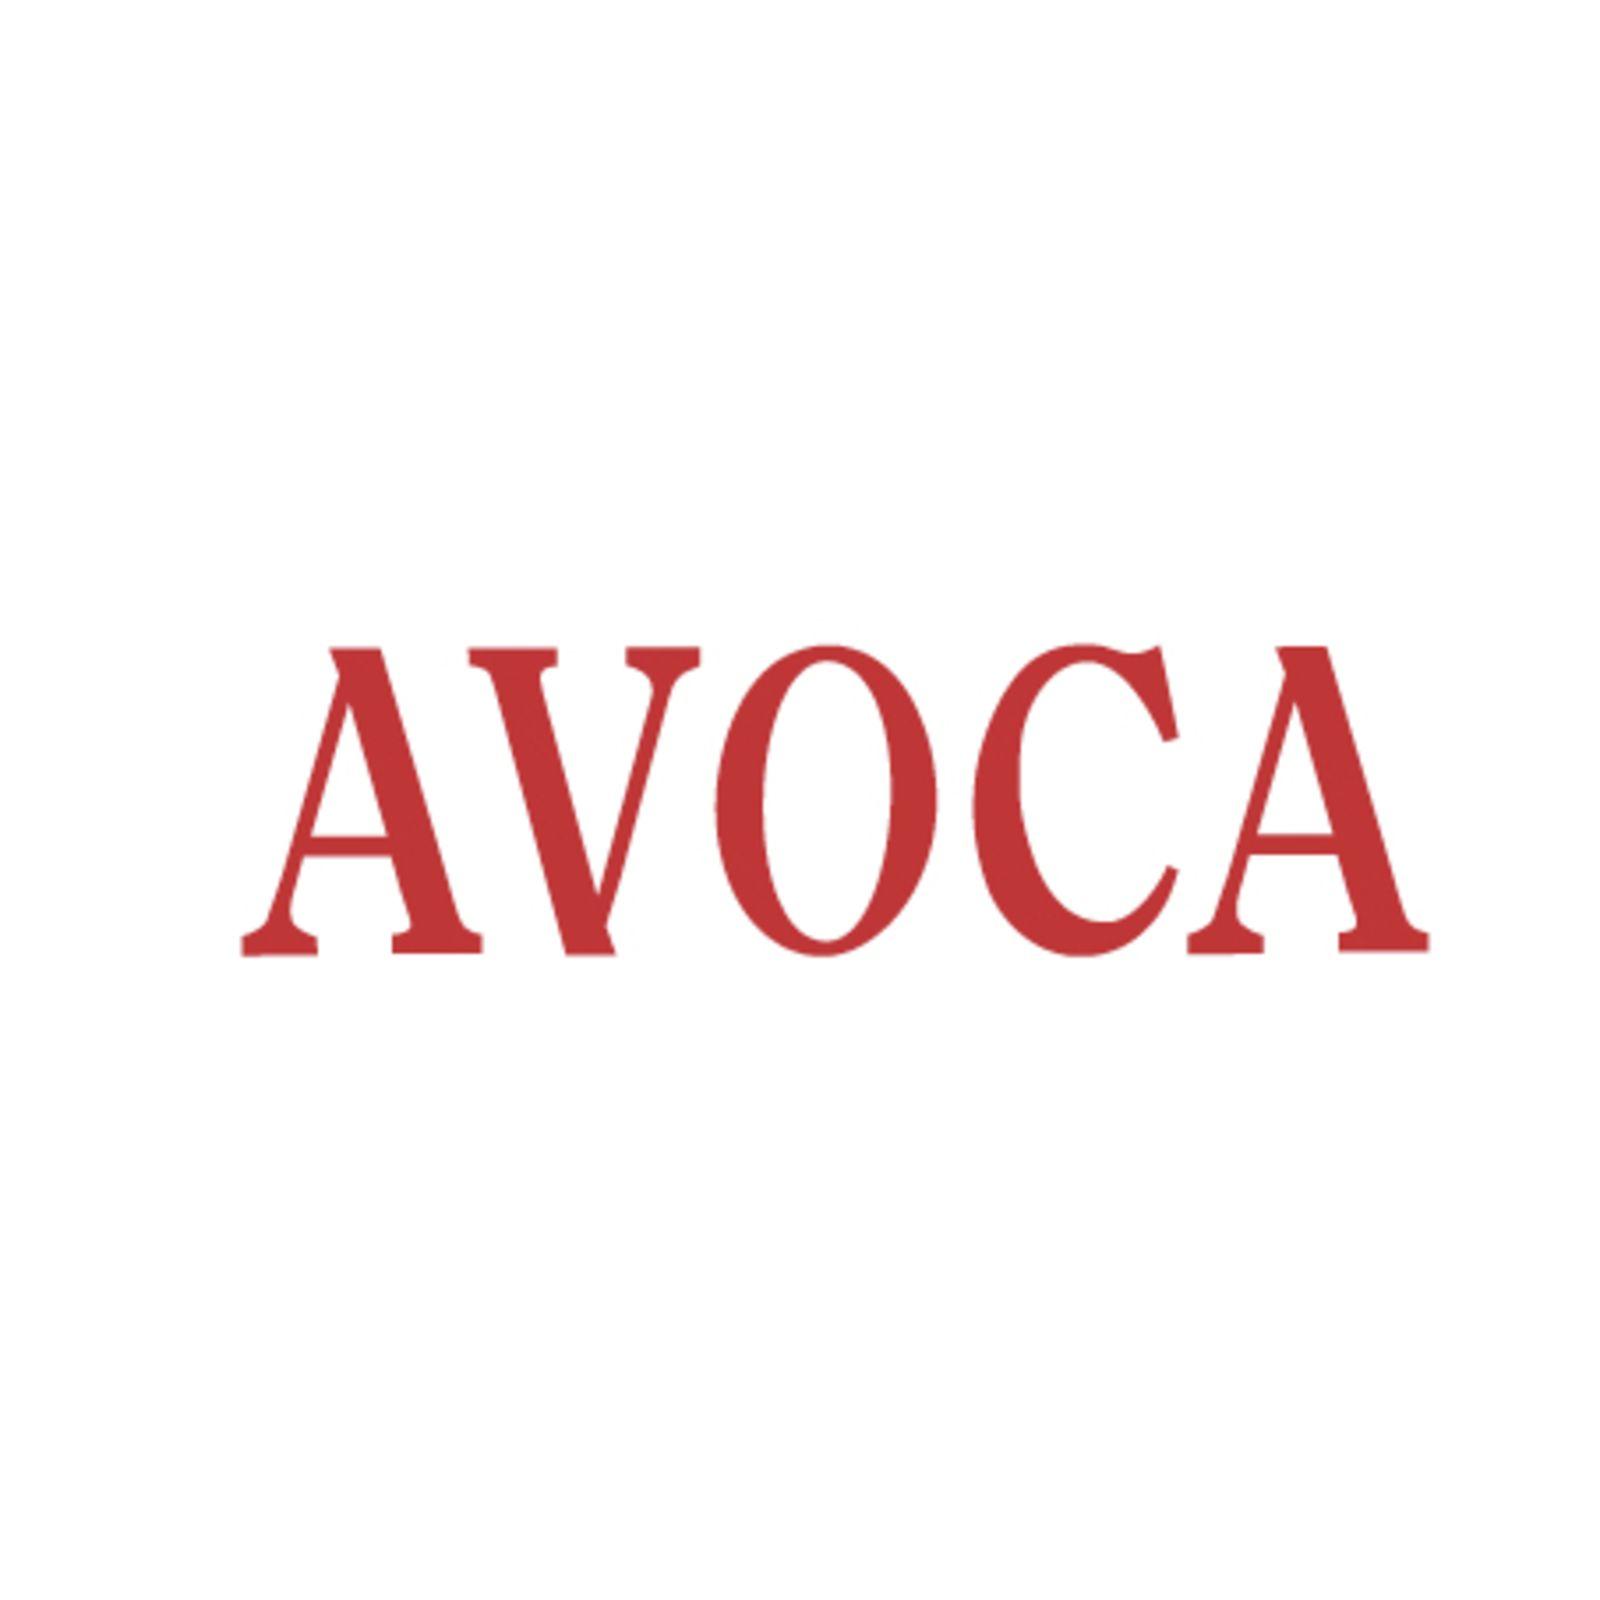 Avoca (Bild 1)